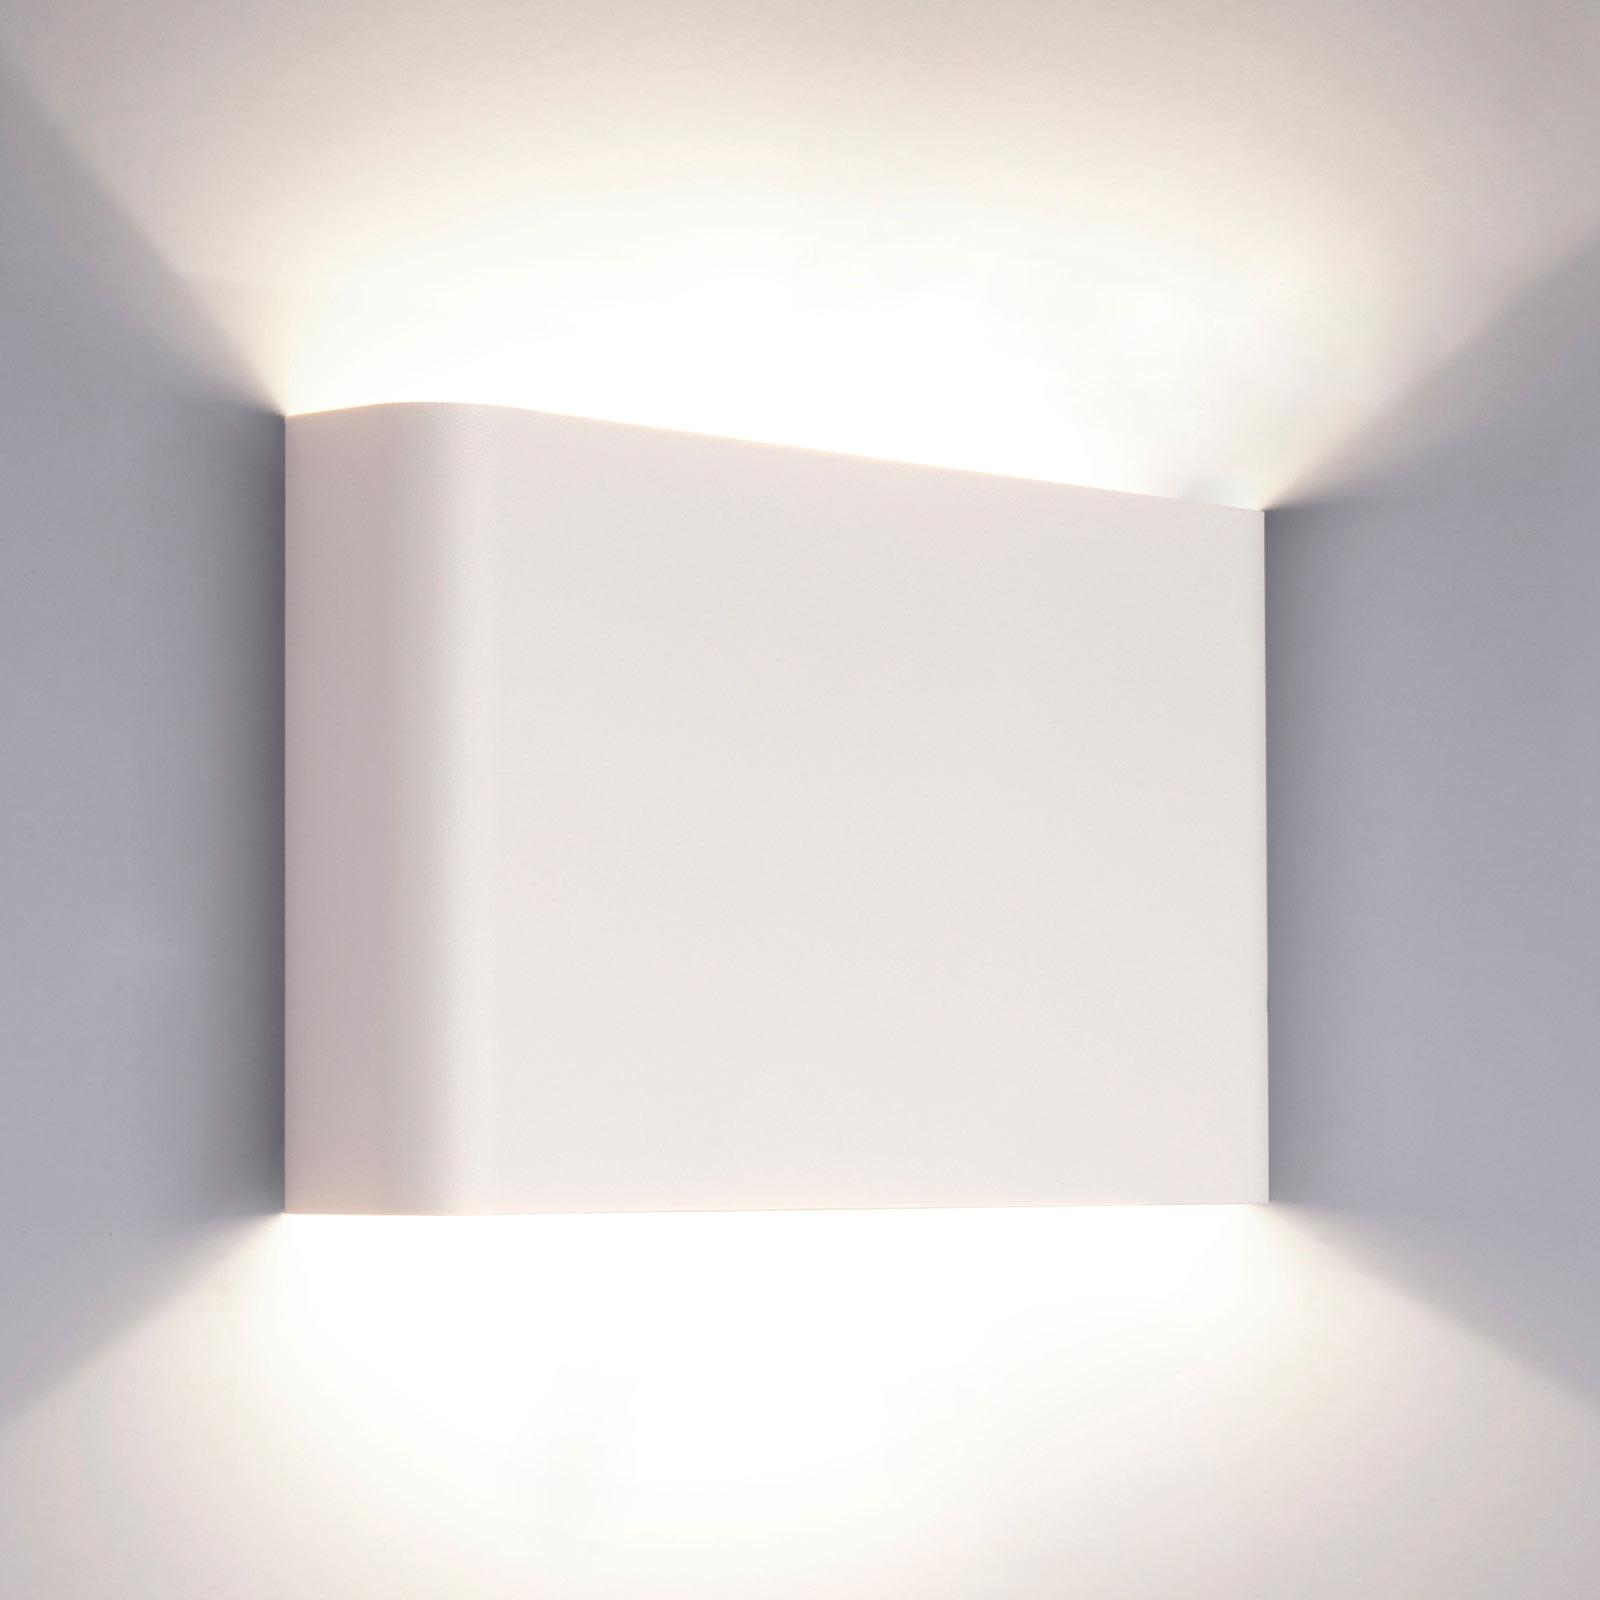 Lampa ścienna Haga z metalu, up & down, biała